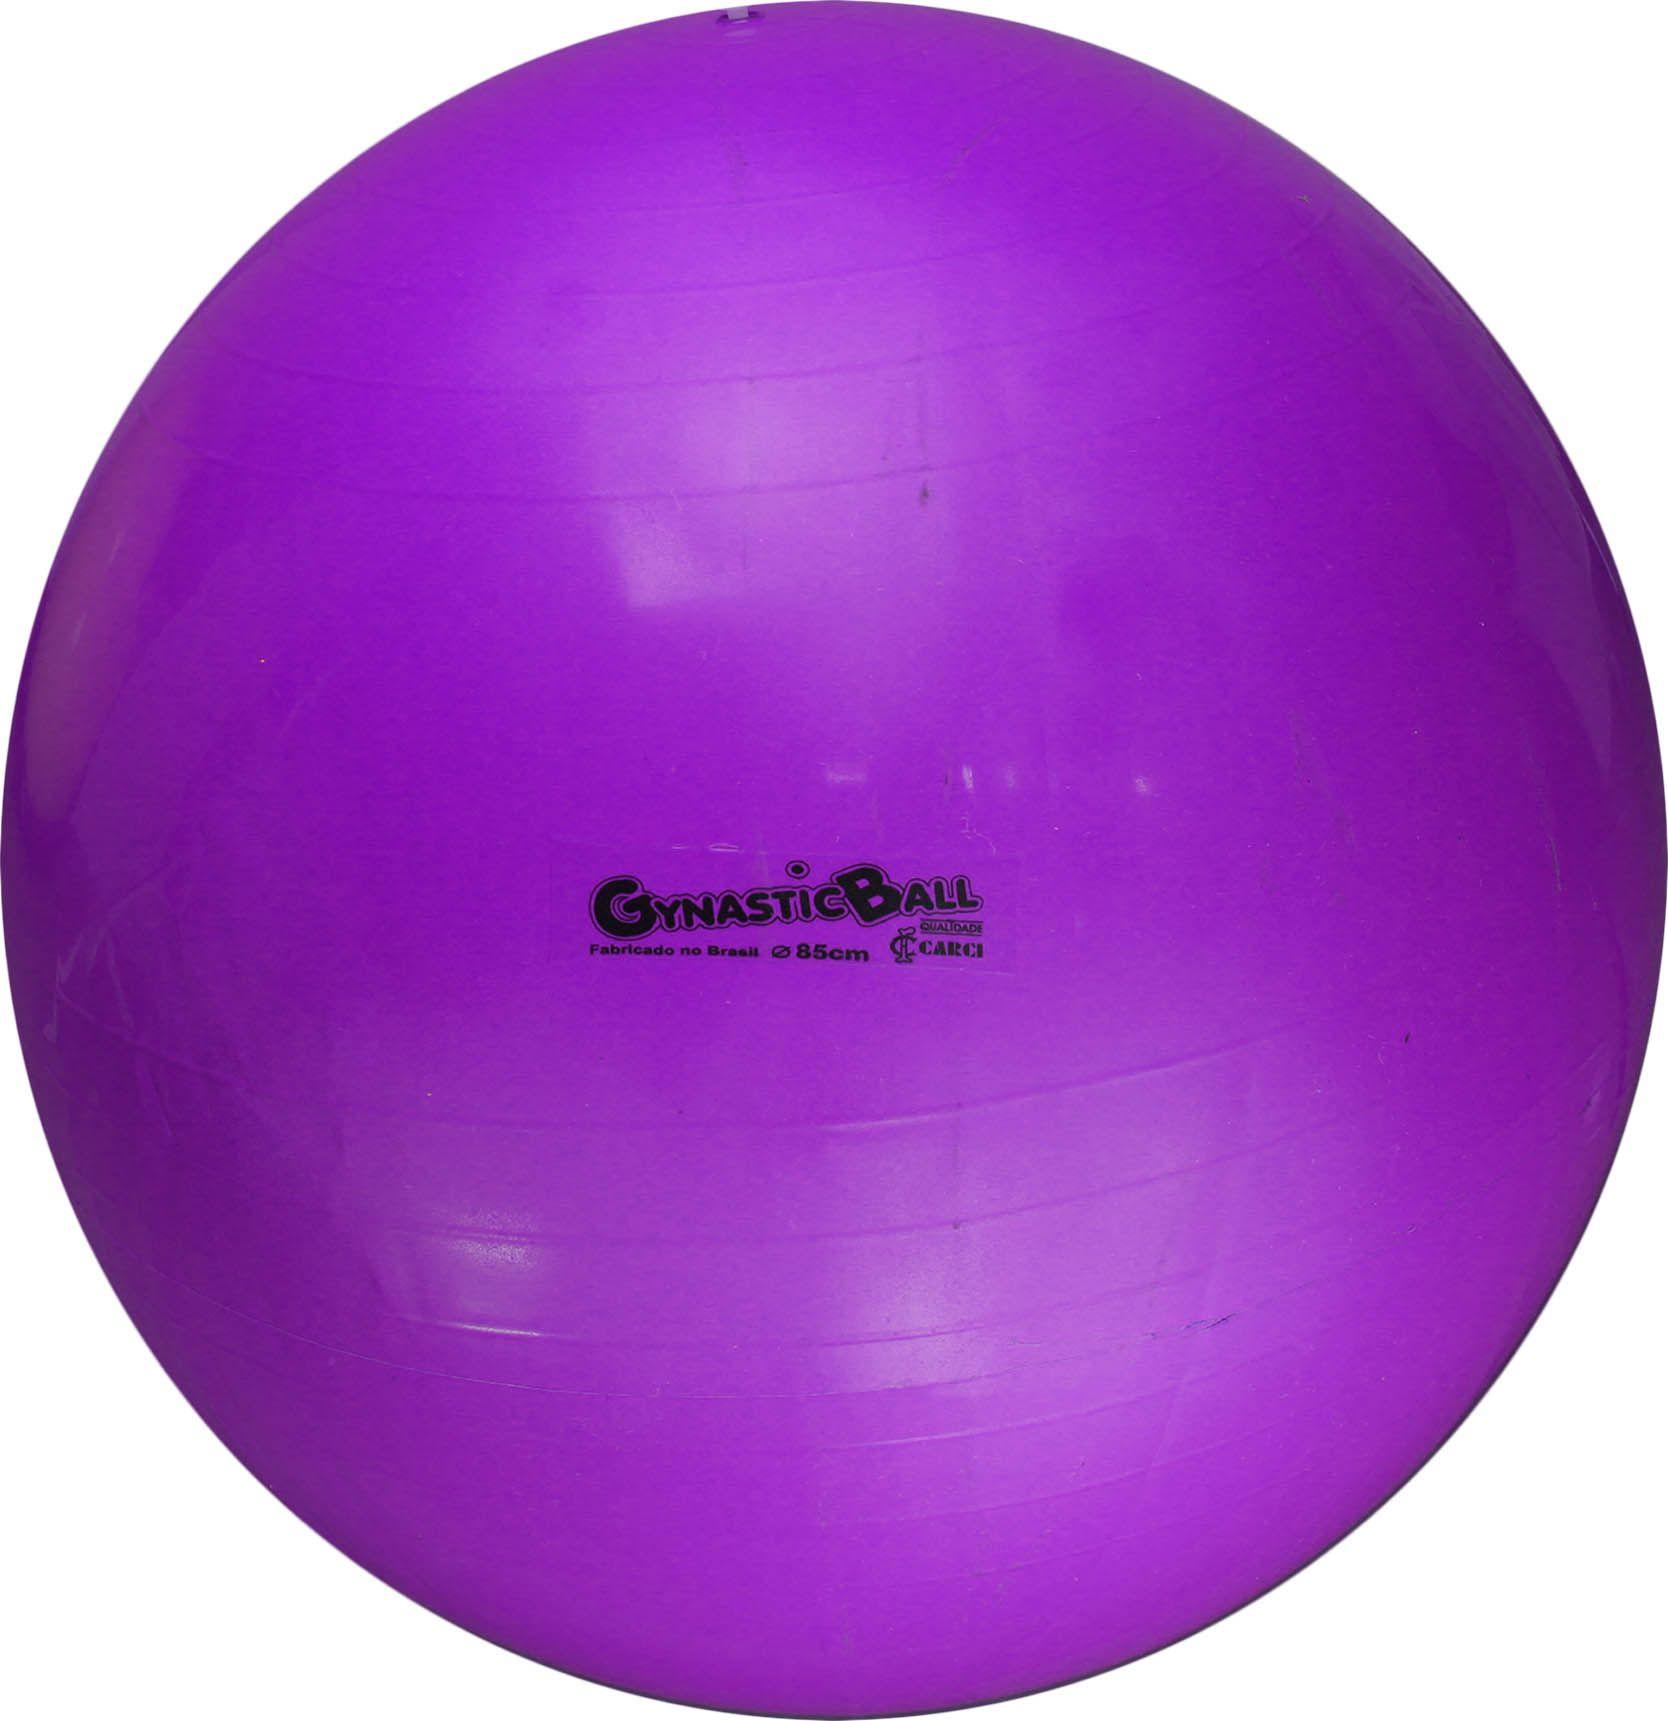 Bola suíça para pilates 95cm Gynastic Ball - roxa - BL.01.95